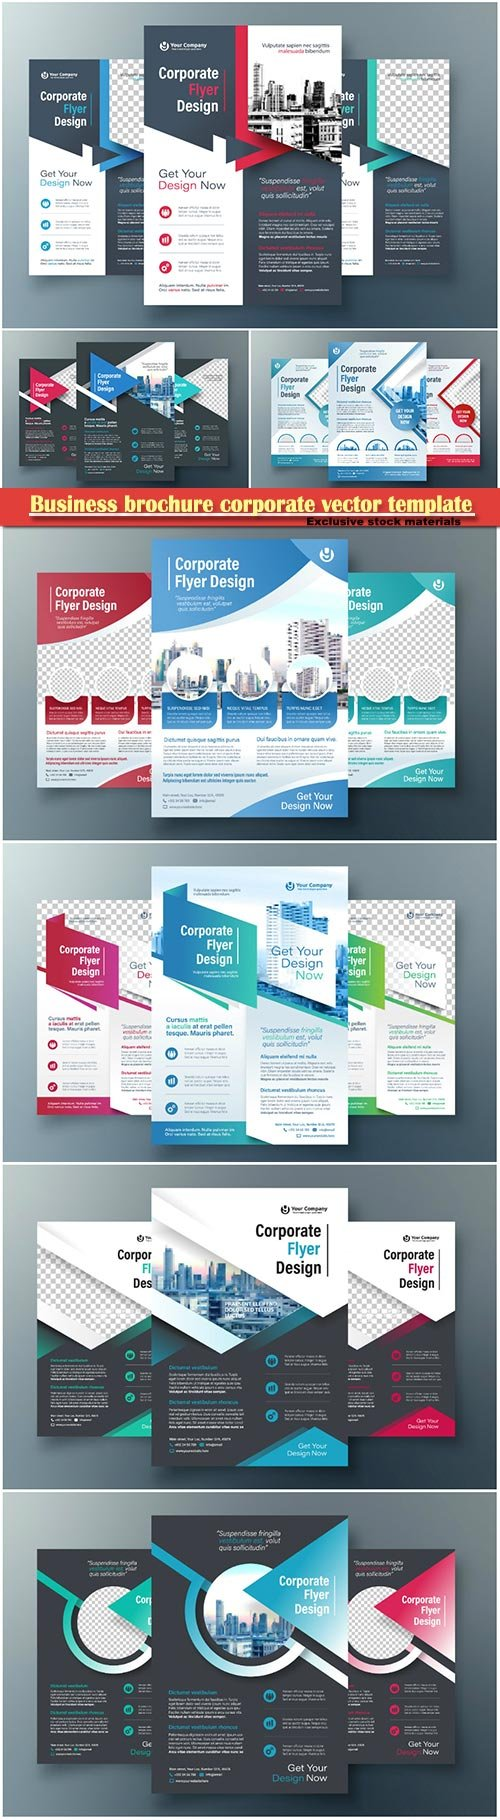 Business brochure corporate vector template, magazine flyer mockup # 11